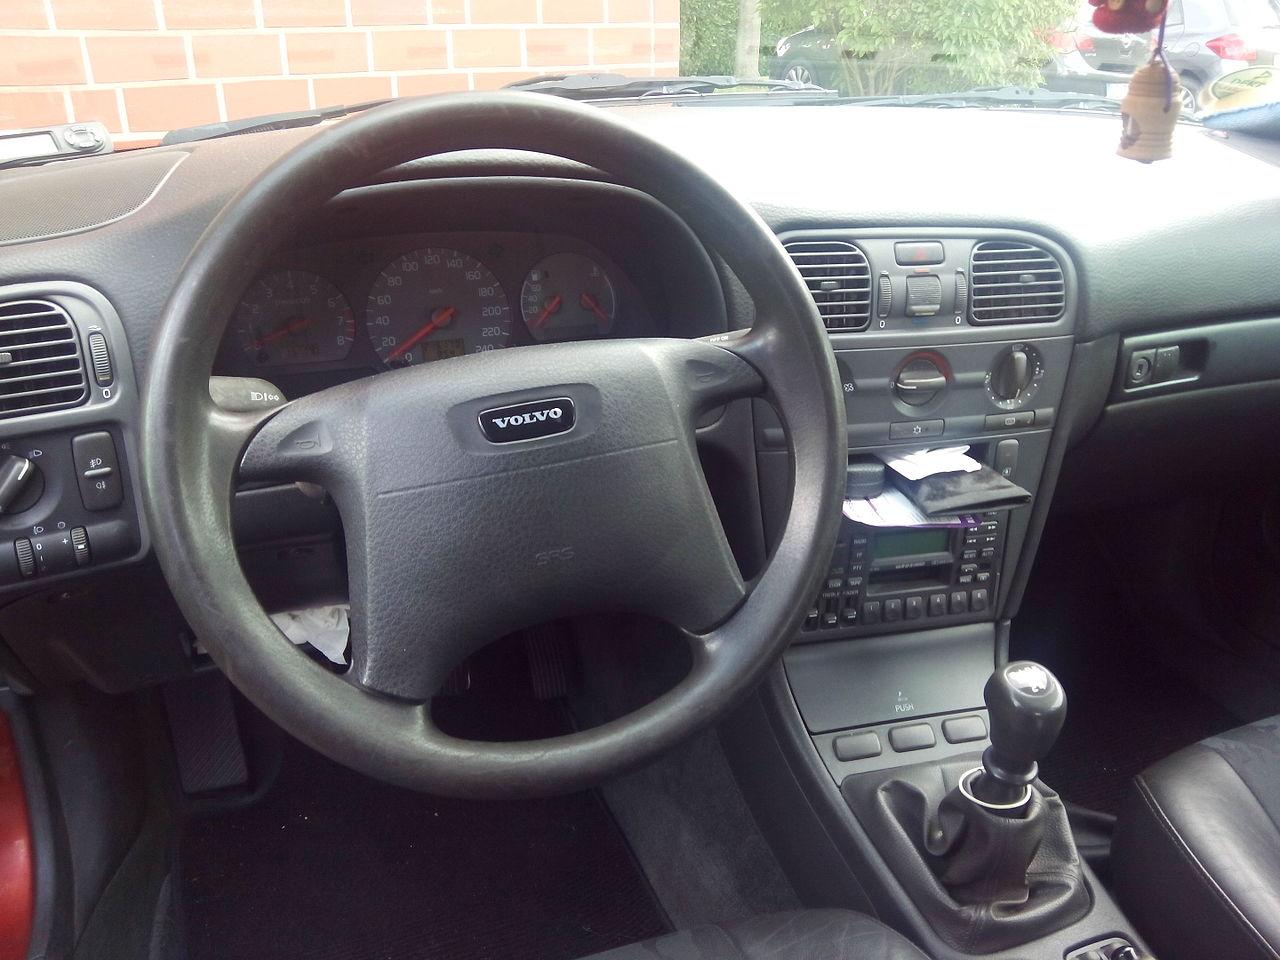 File:Volvo V40 Interior (1998).jpg - Wikimedia Commons